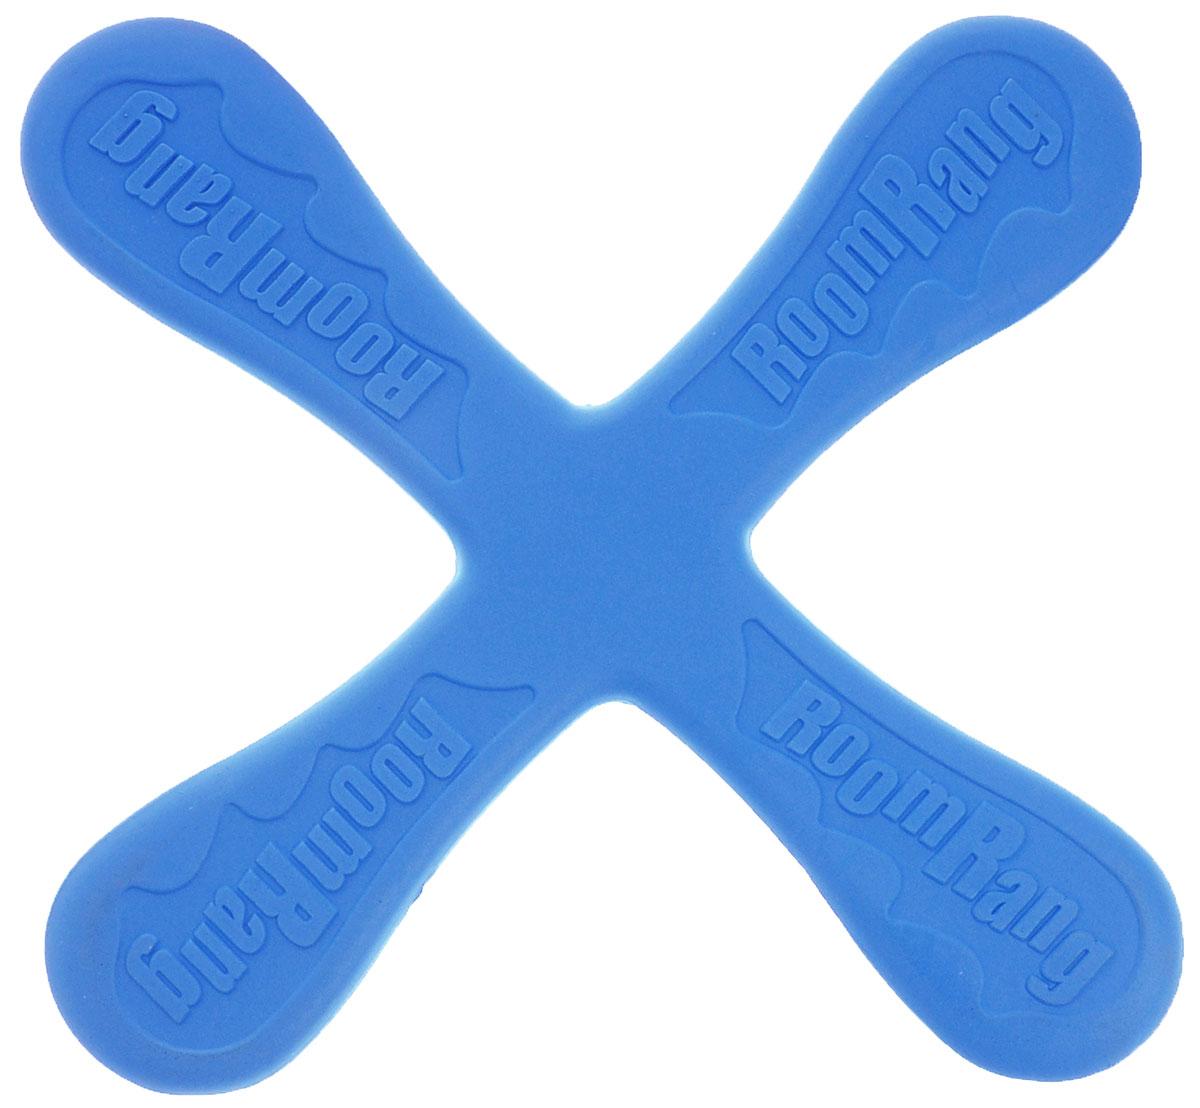 Zilmer Бумеранг Веселый ветер цвет синий